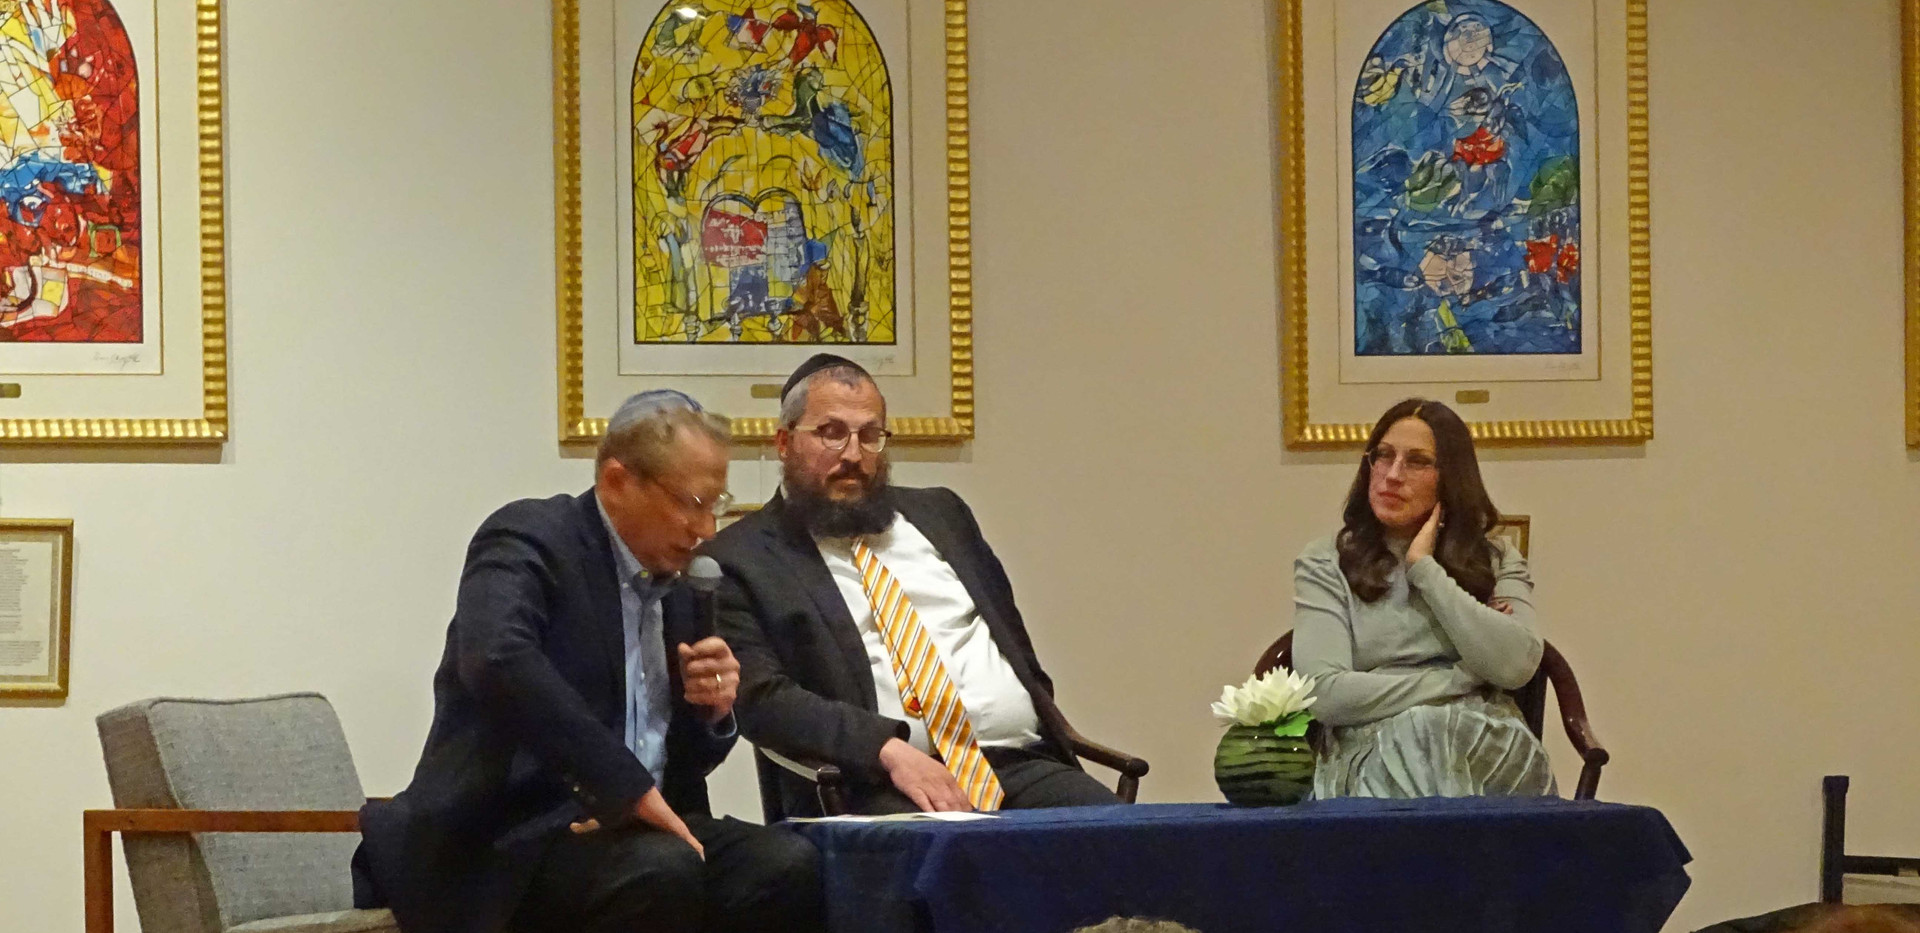 Dr. Rich Gerber, Rabbi Dovid & Binie Holtzberg